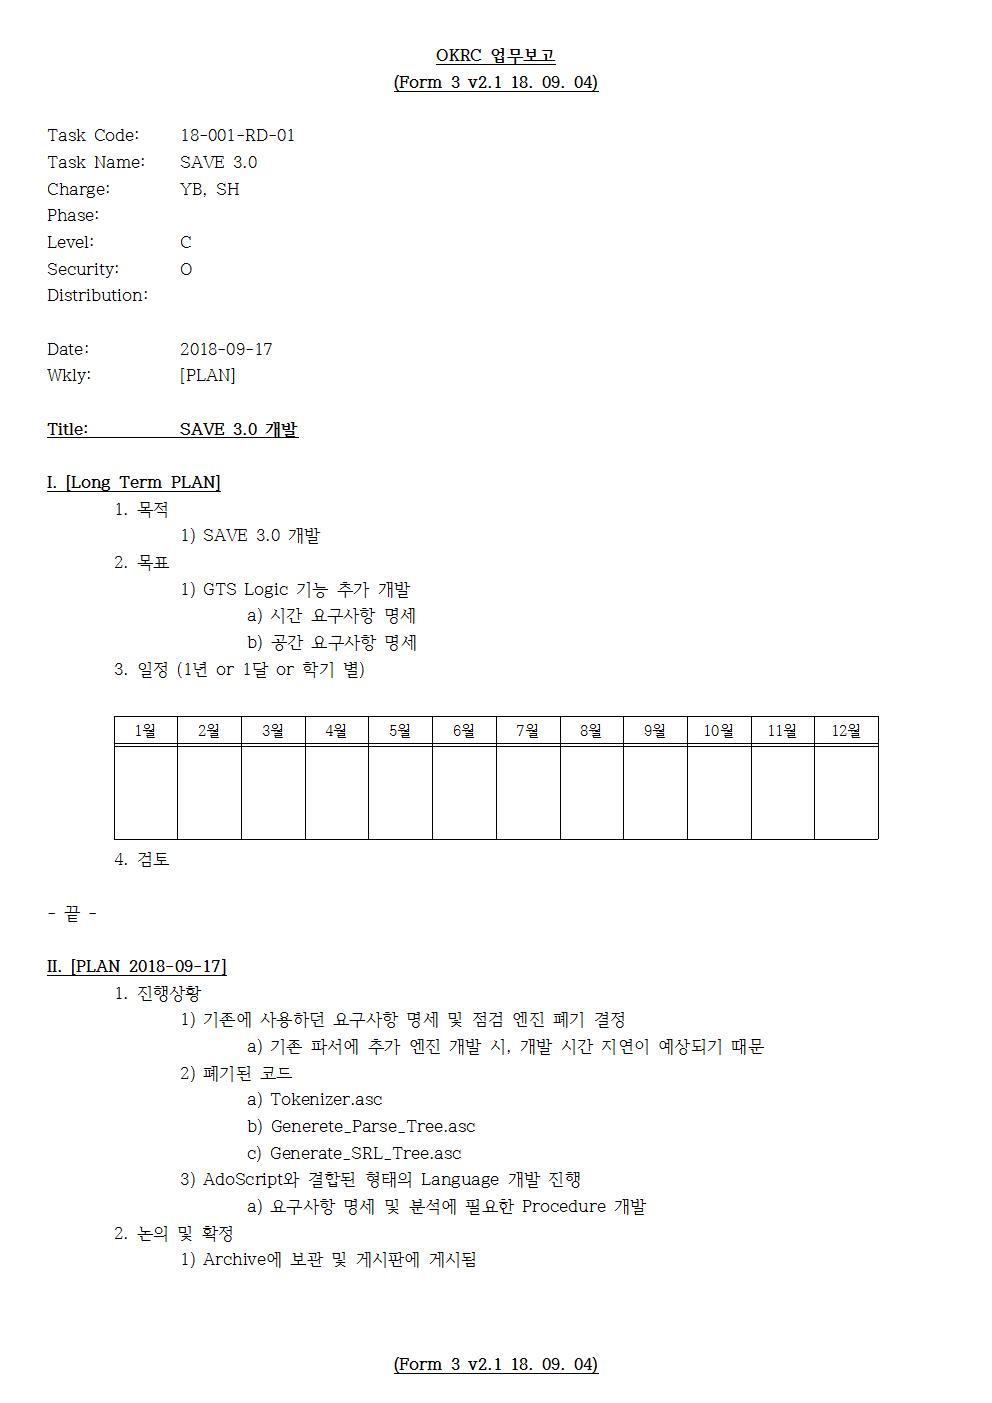 D-[18-001-RD-01]-[SAVE 3.0]-[2018-09-17][SH]001.jpg